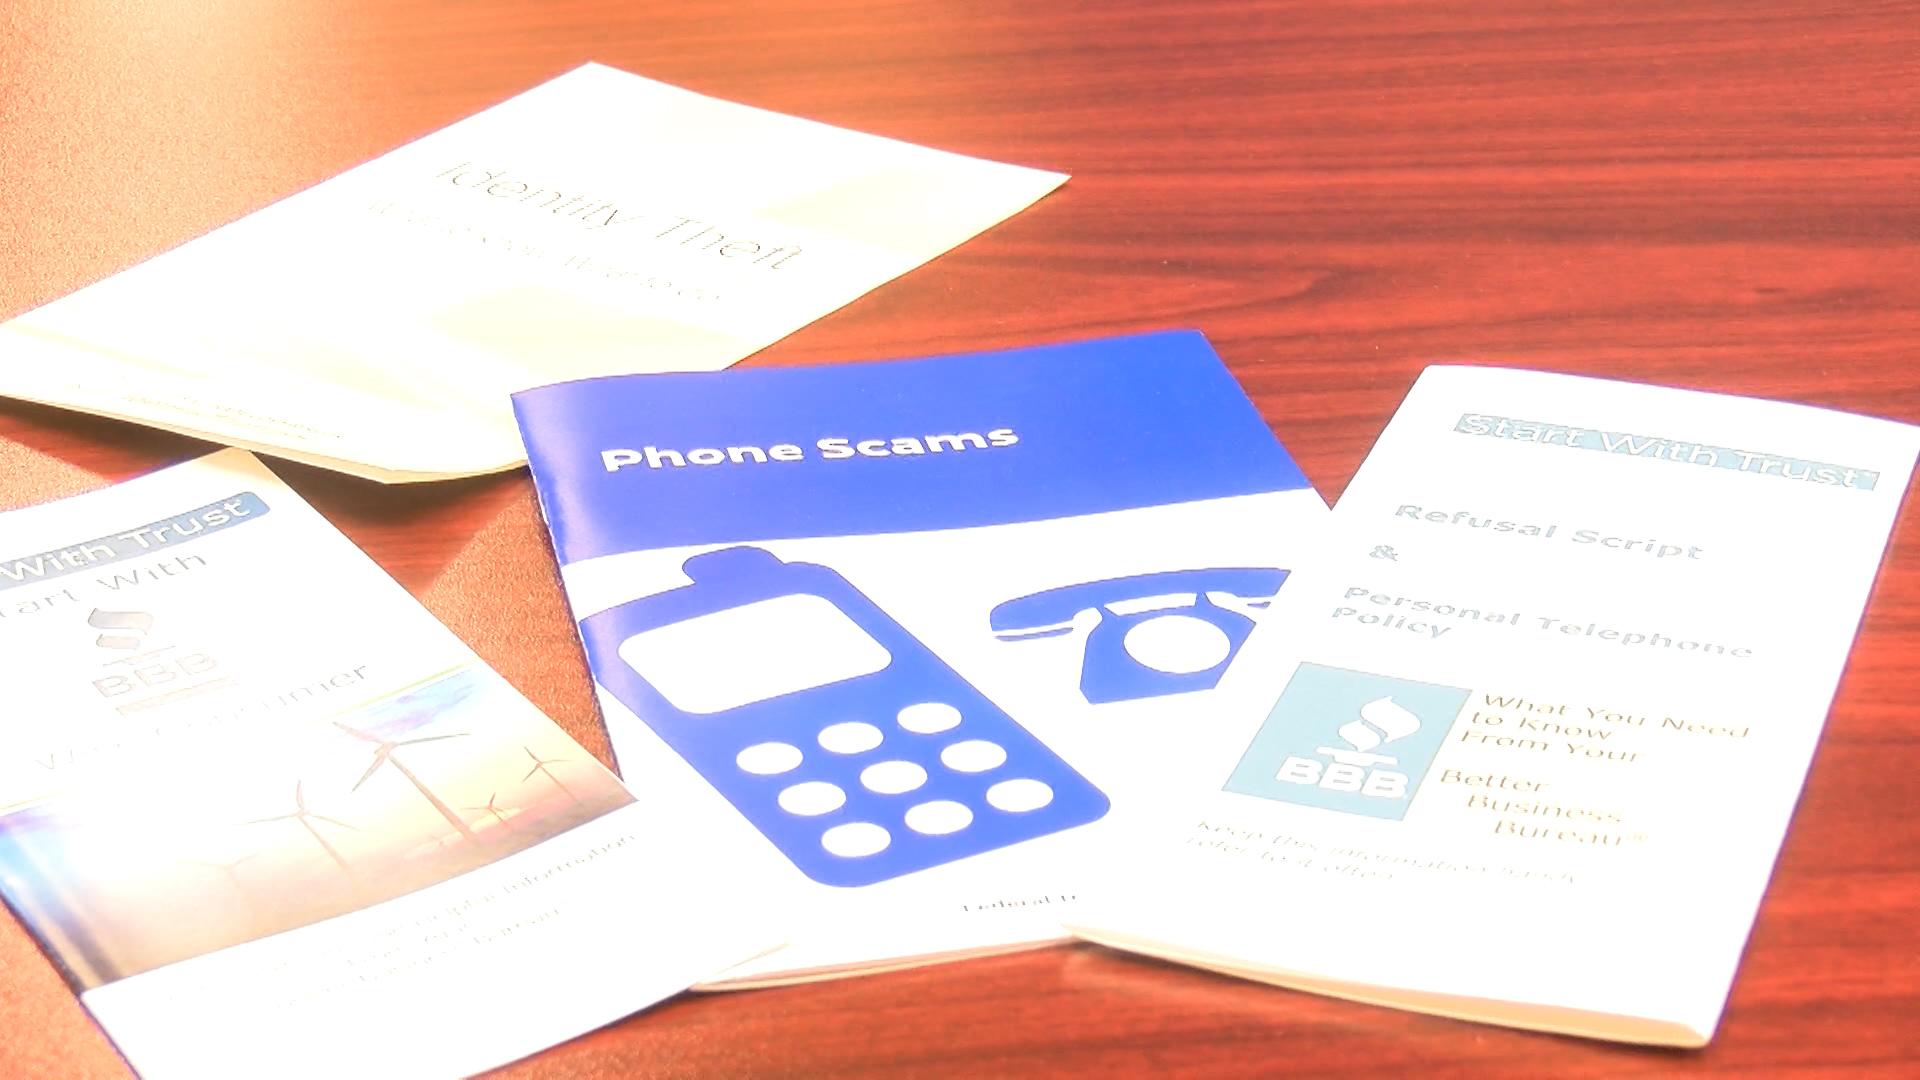 phone scams.jpg